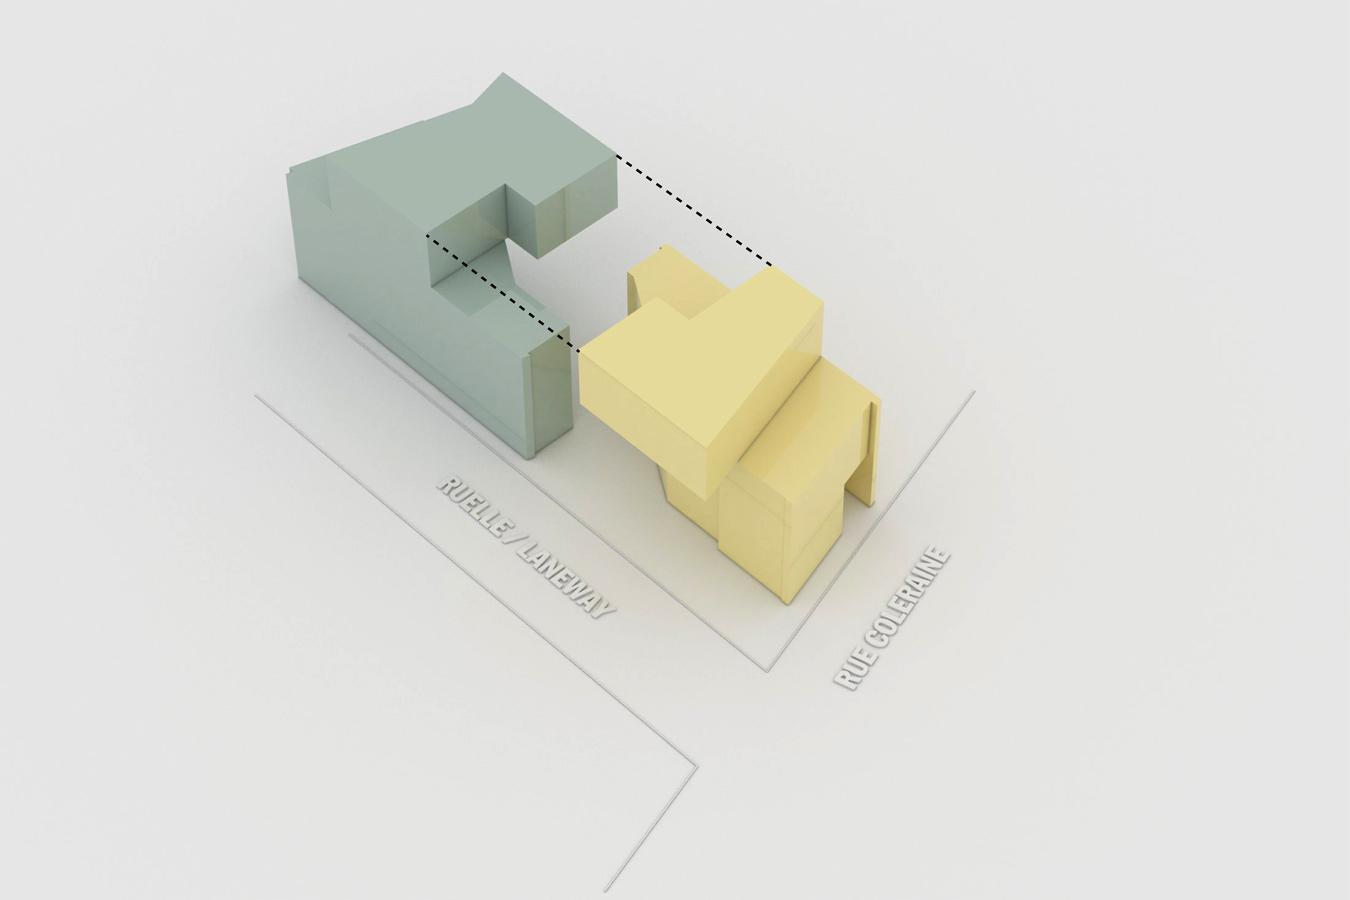 Diagrama 2 de Casa Coleraine de NatureHumaine